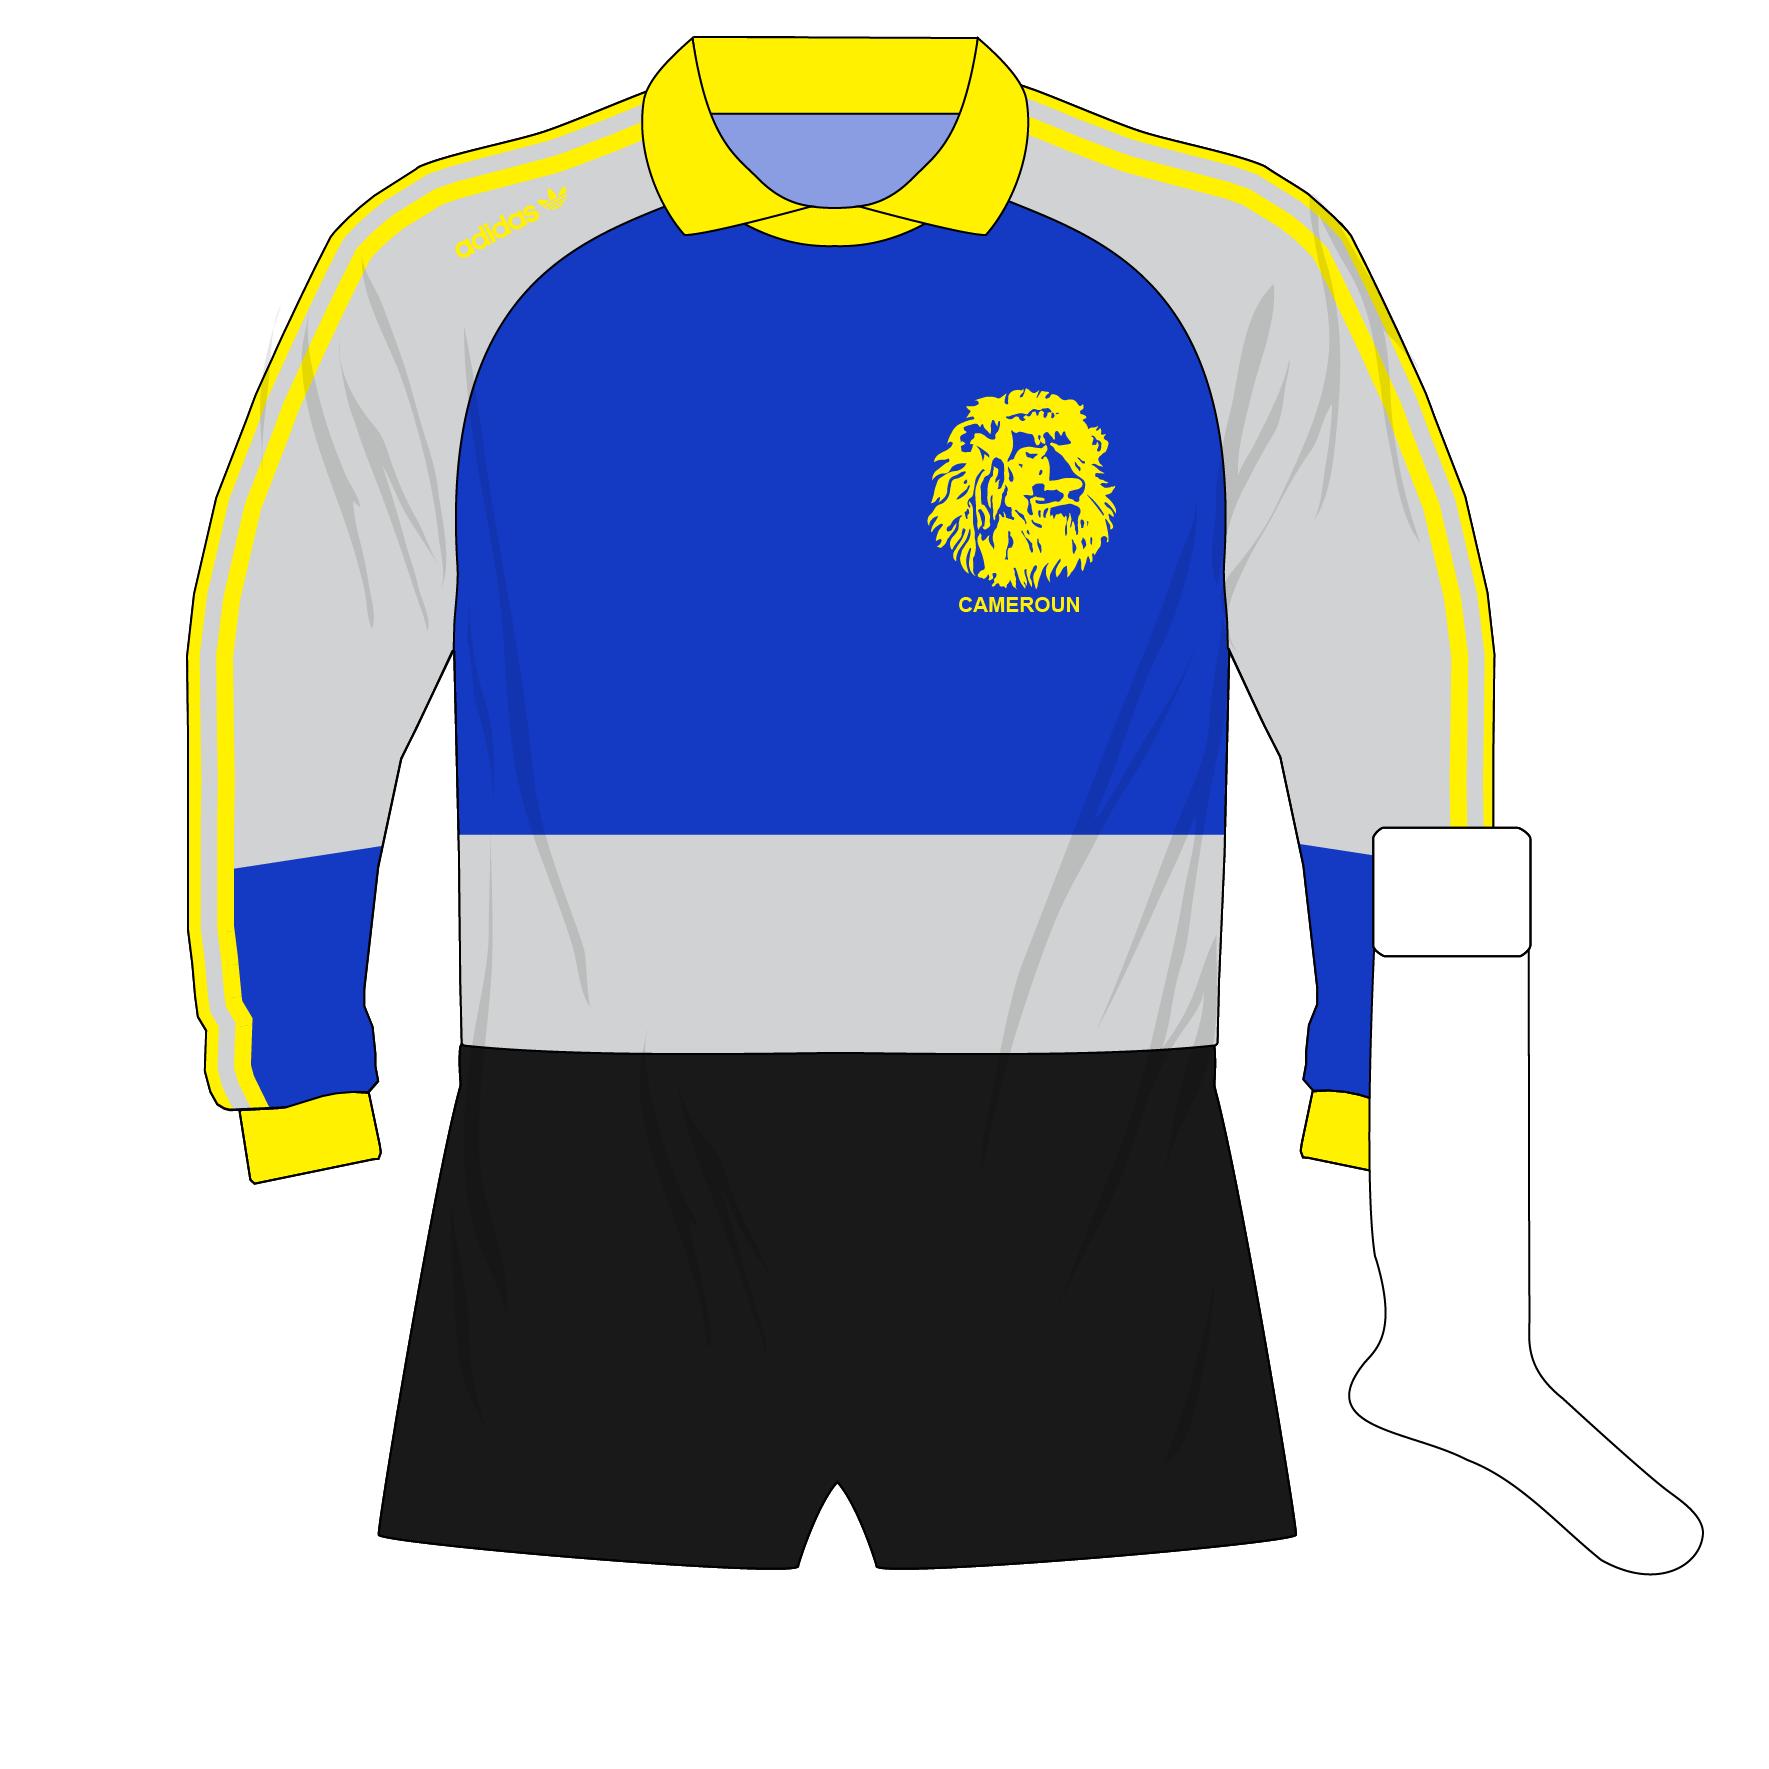 adidas-cameroun-blue-goalkeeper-shirt-jersey-maillot-1990-nkono